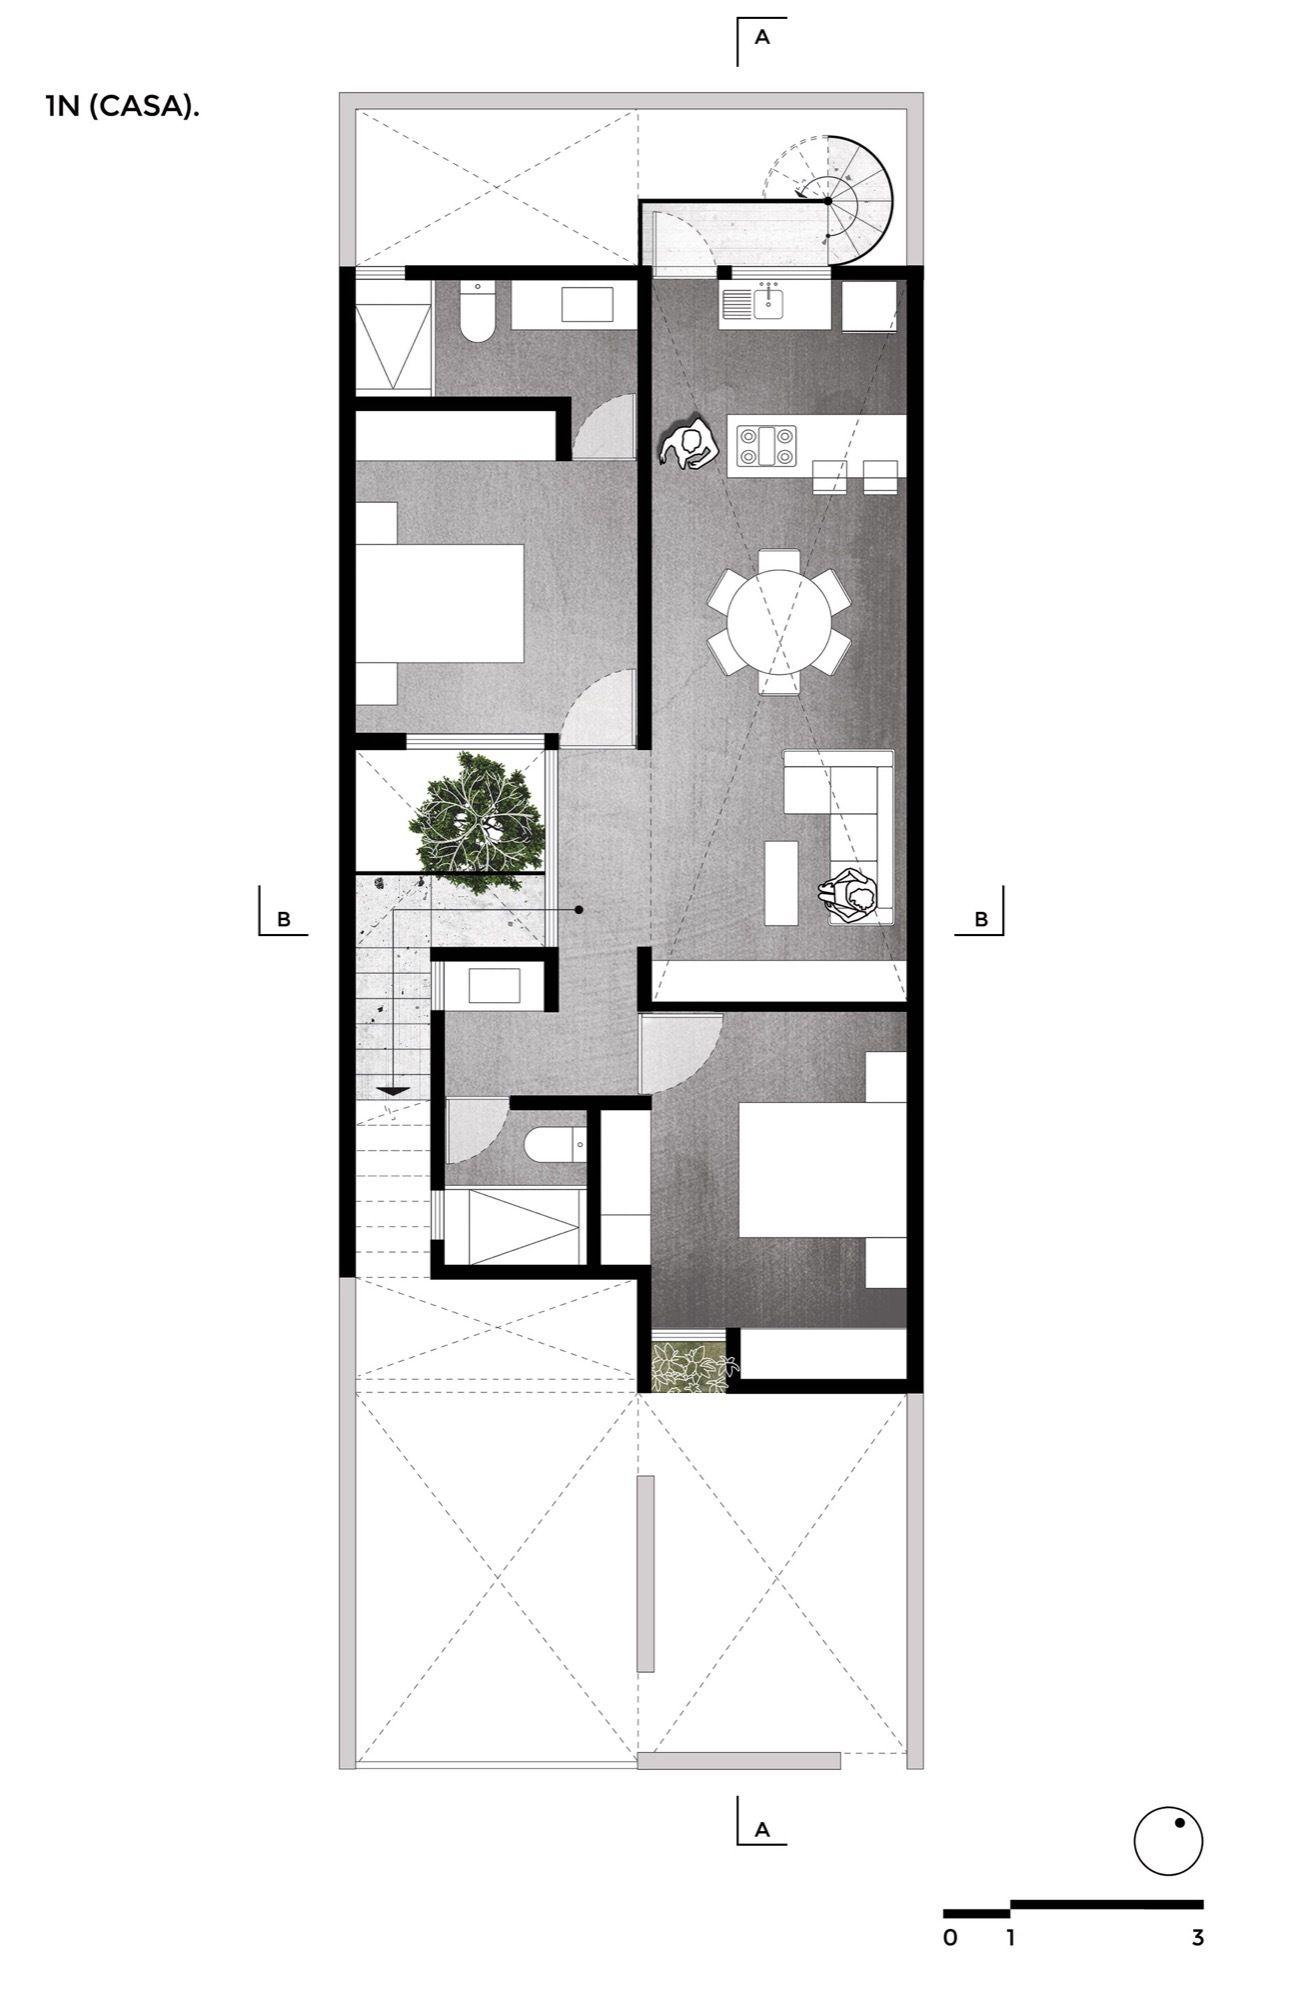 Galer a de casa estudio intersticial arquitectura 16 for Casa estudio arquitectura